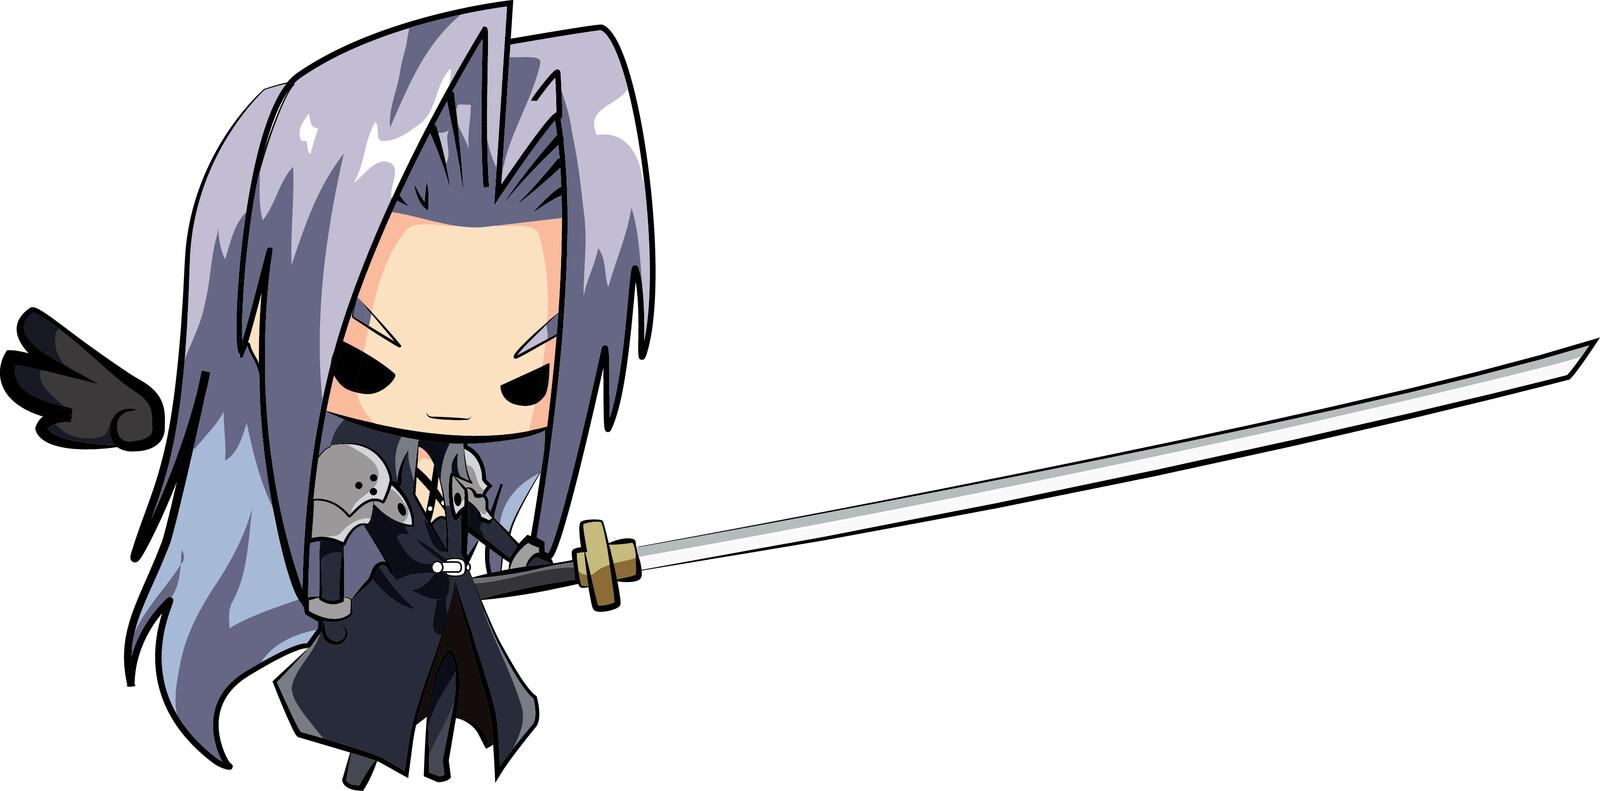 Sephiroth Chibi version